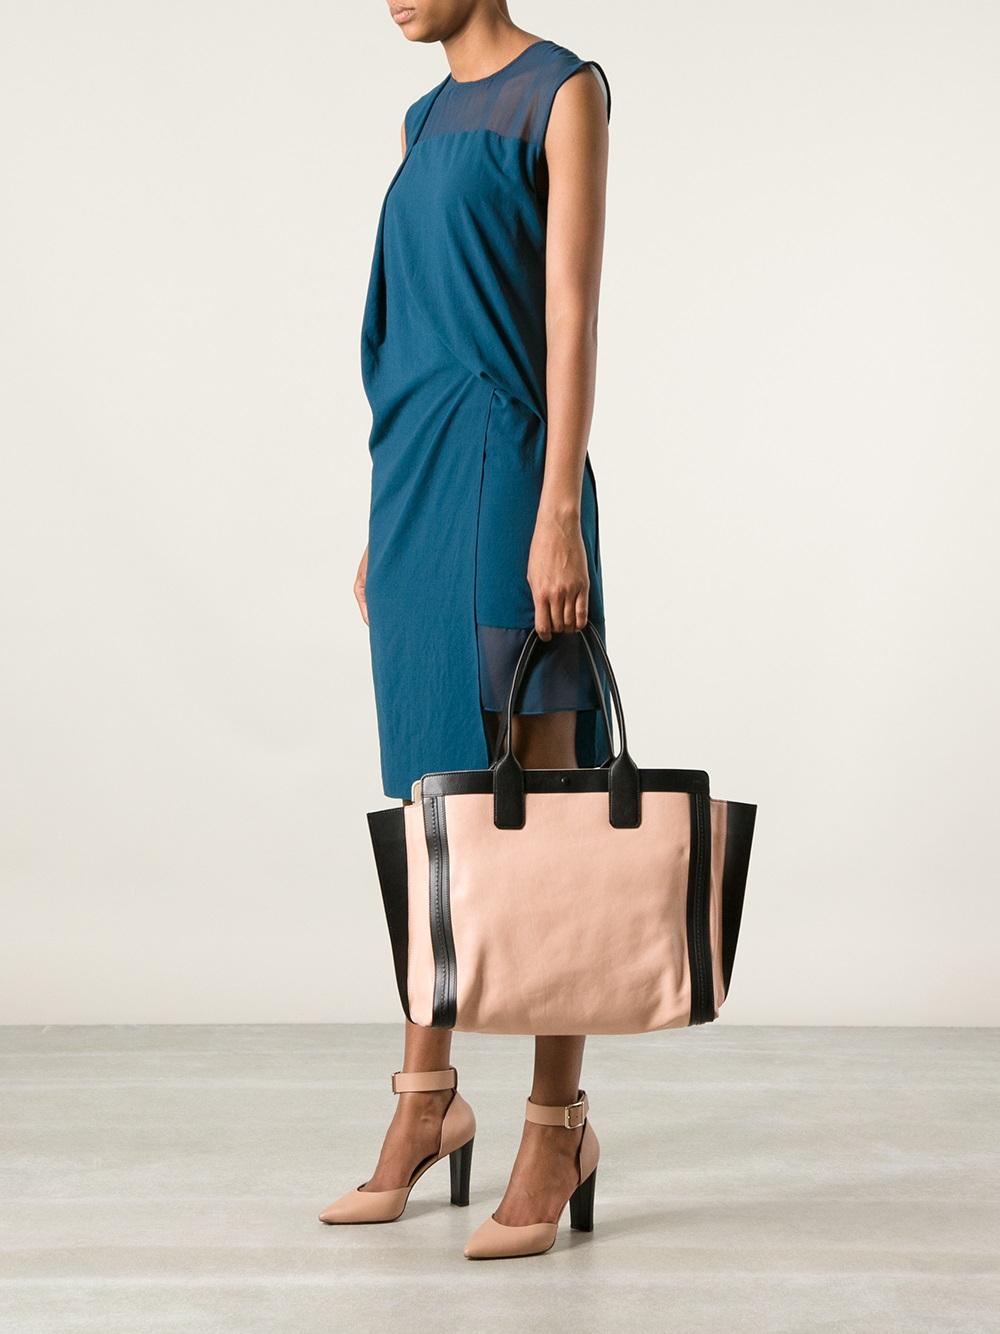 chloe replica bag - Chlo�� Alison Tote in Pink (pink \u0026amp; purple)   Lyst